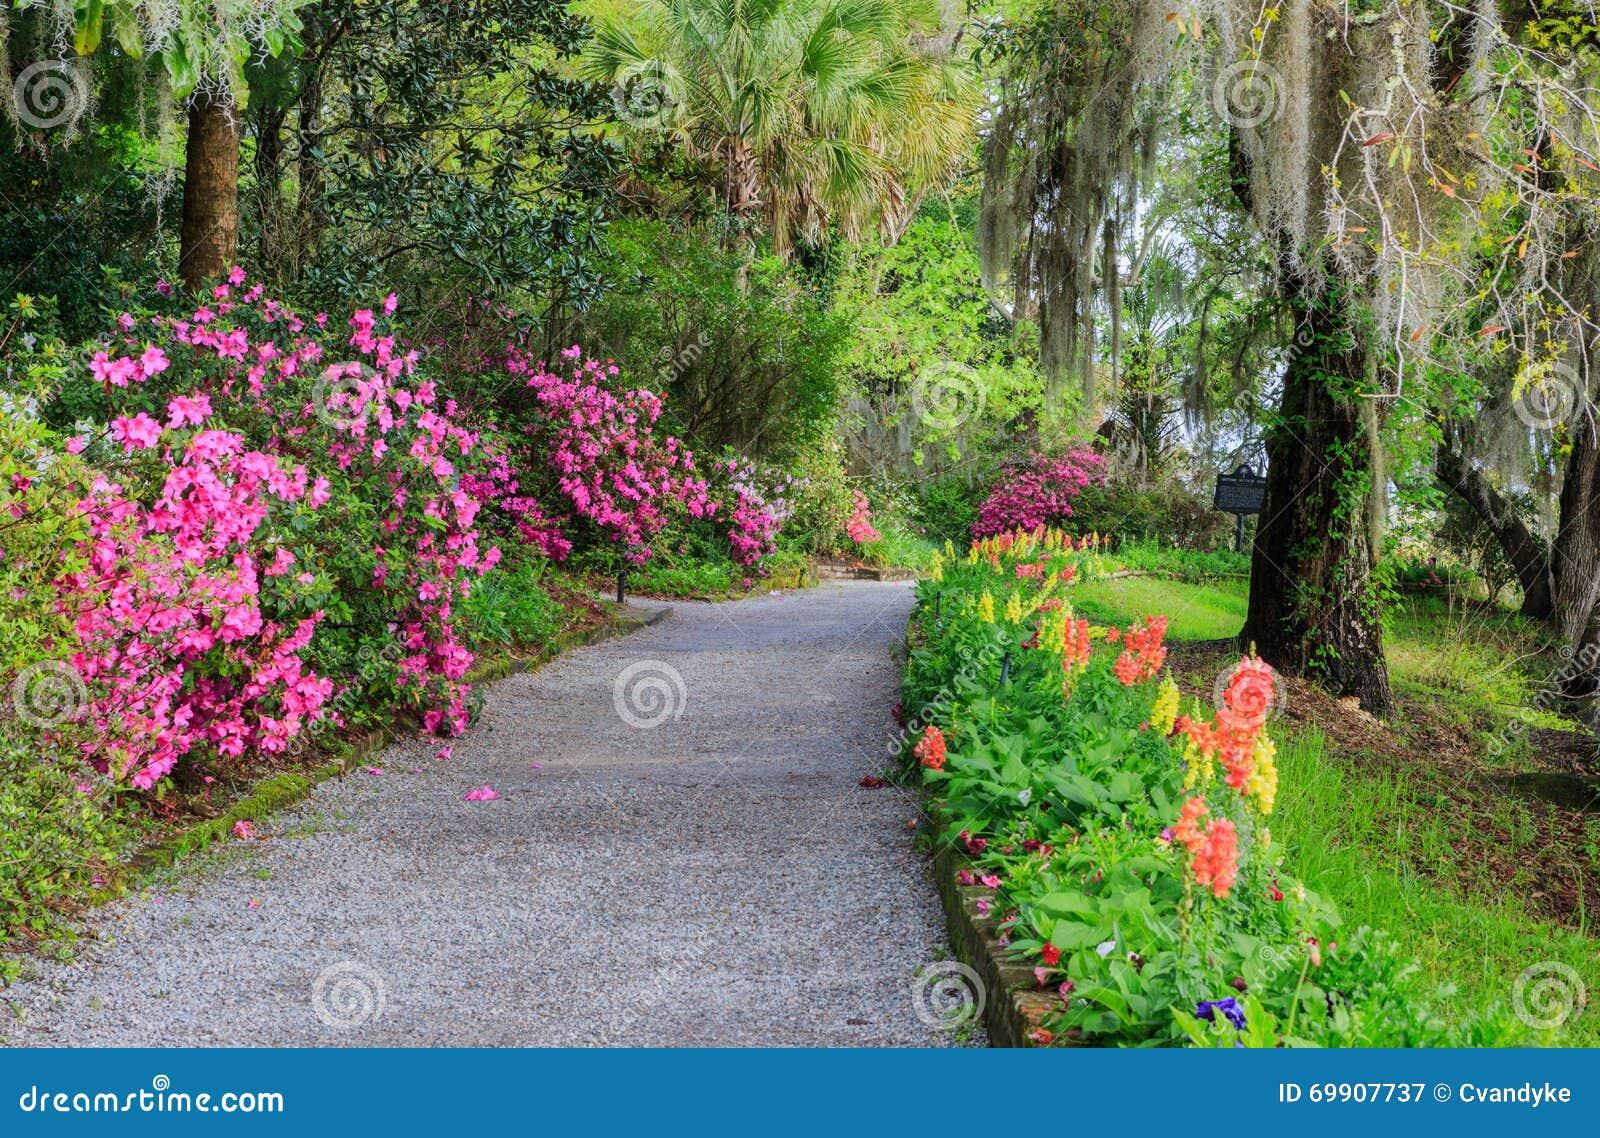 South Carolina Garden Walkway Flowers Azaleas Stock Photo - Image ...